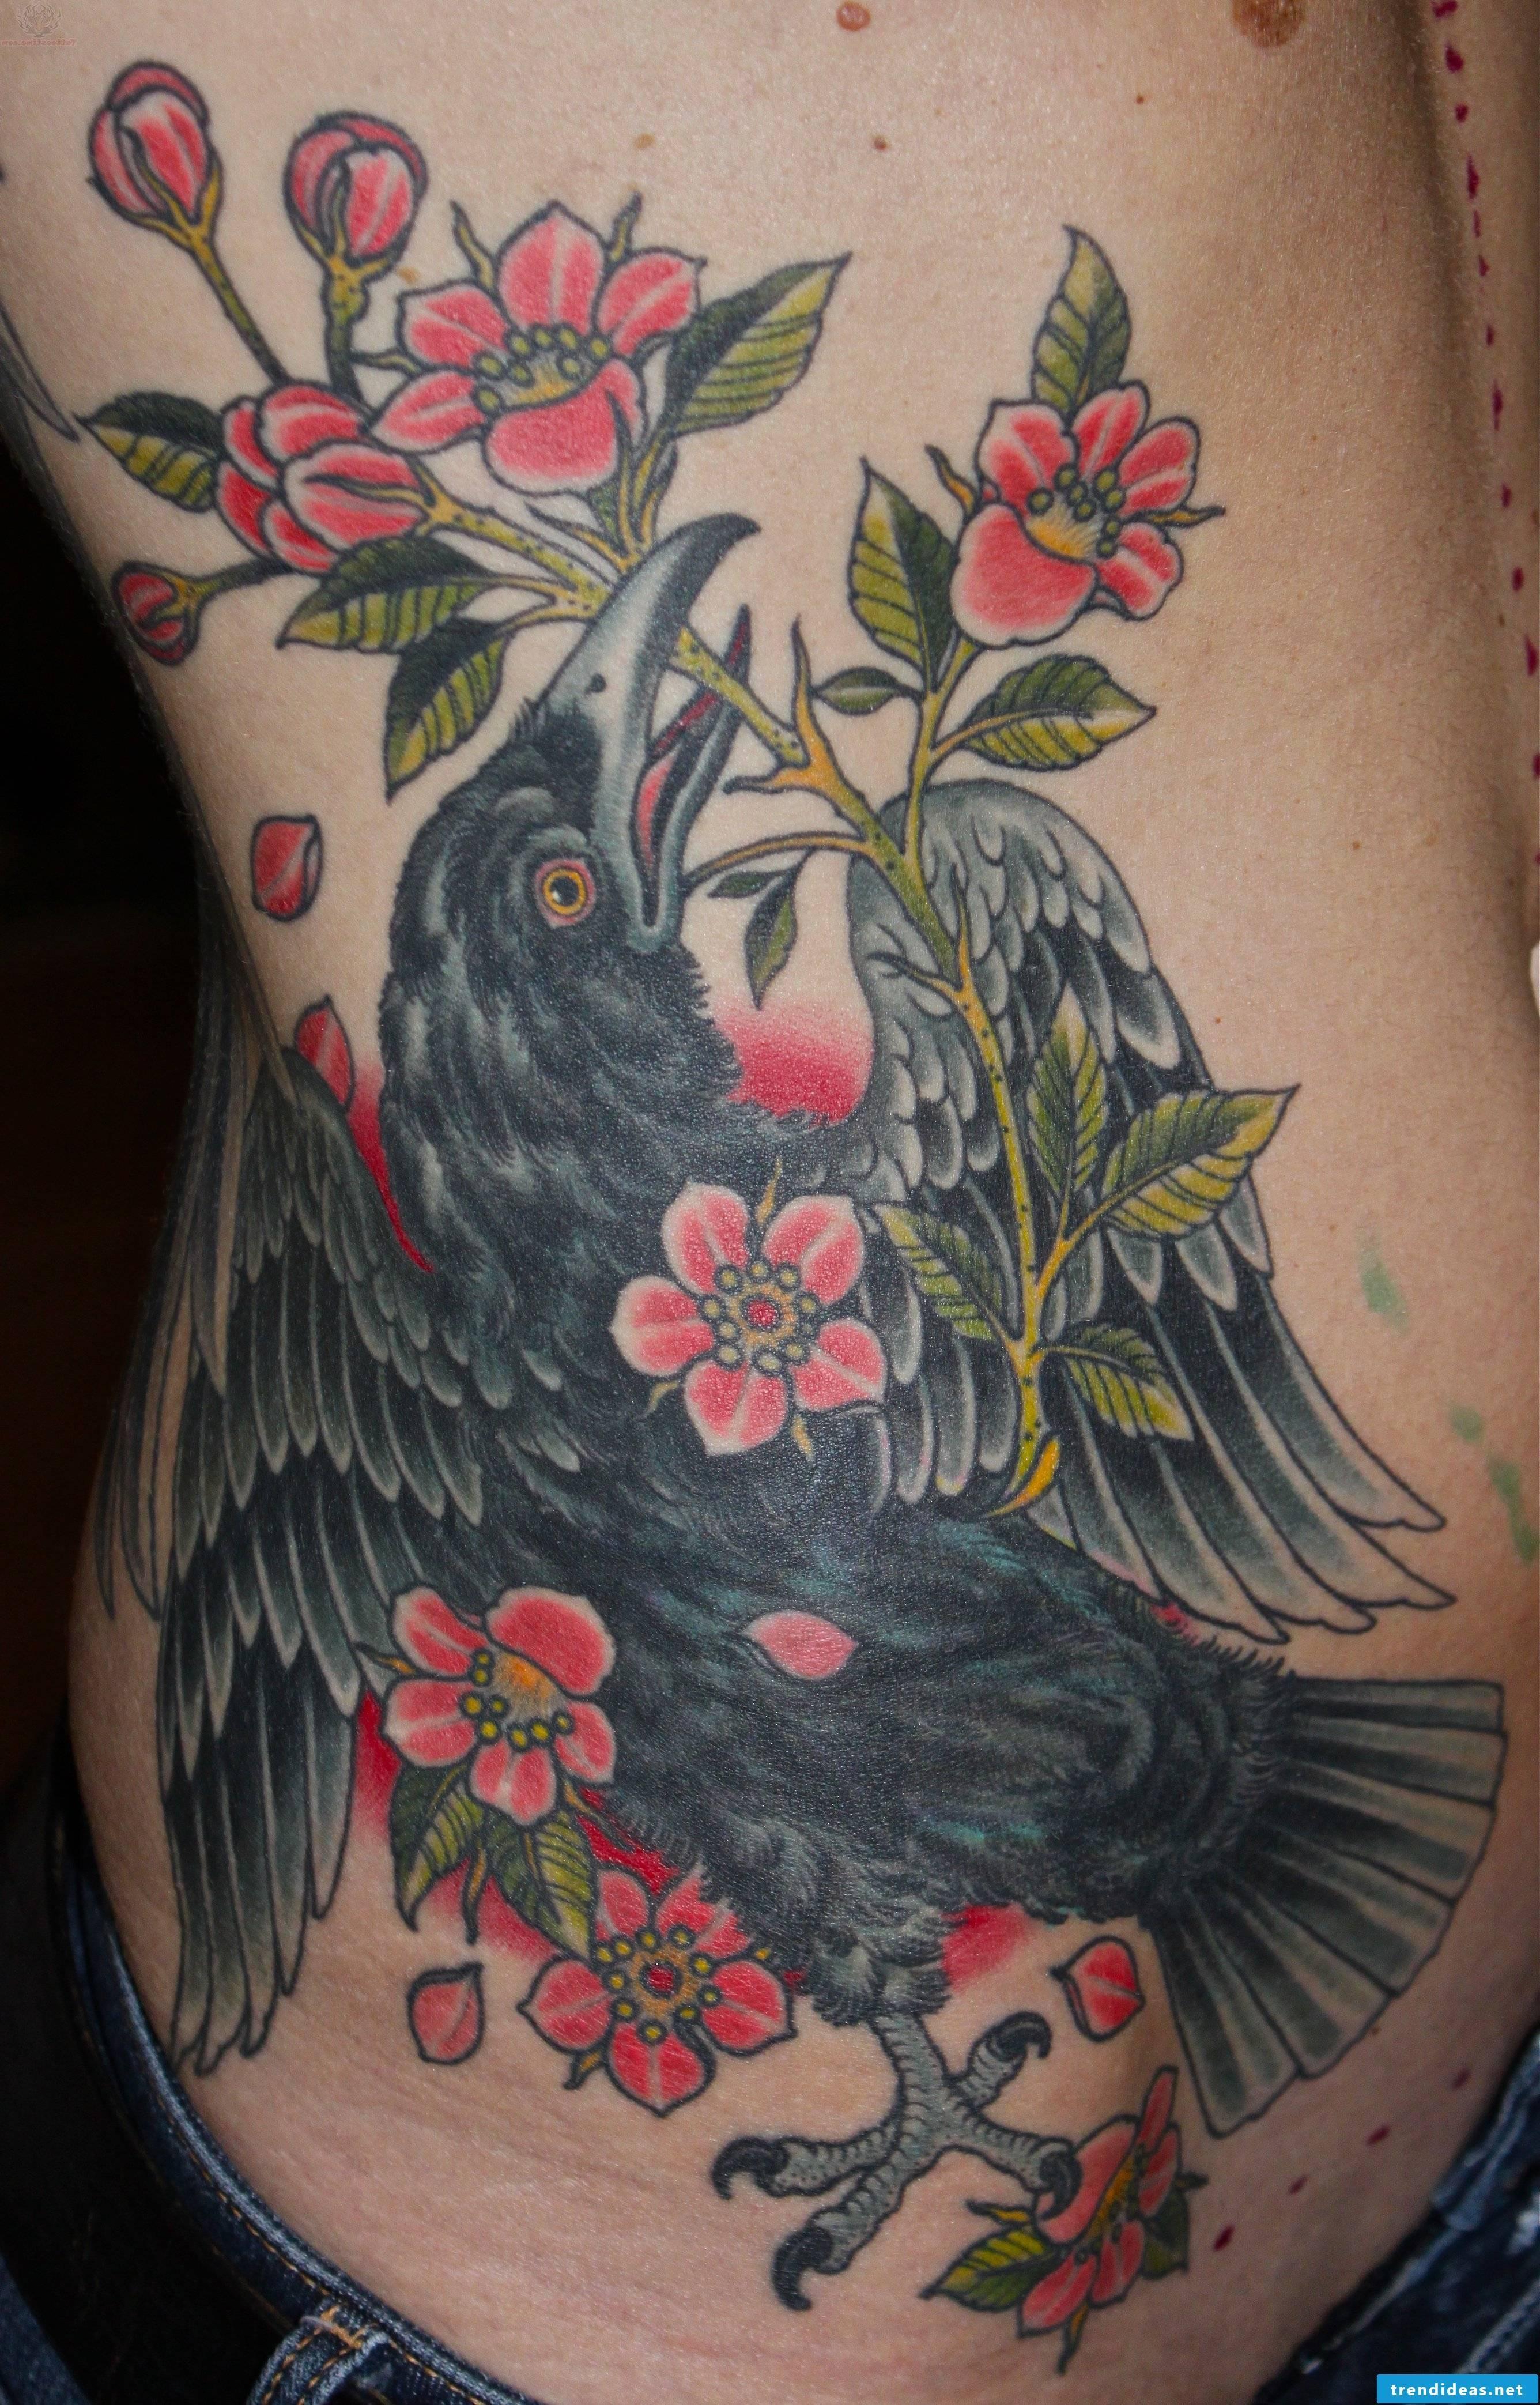 dig-tattoo-bunt